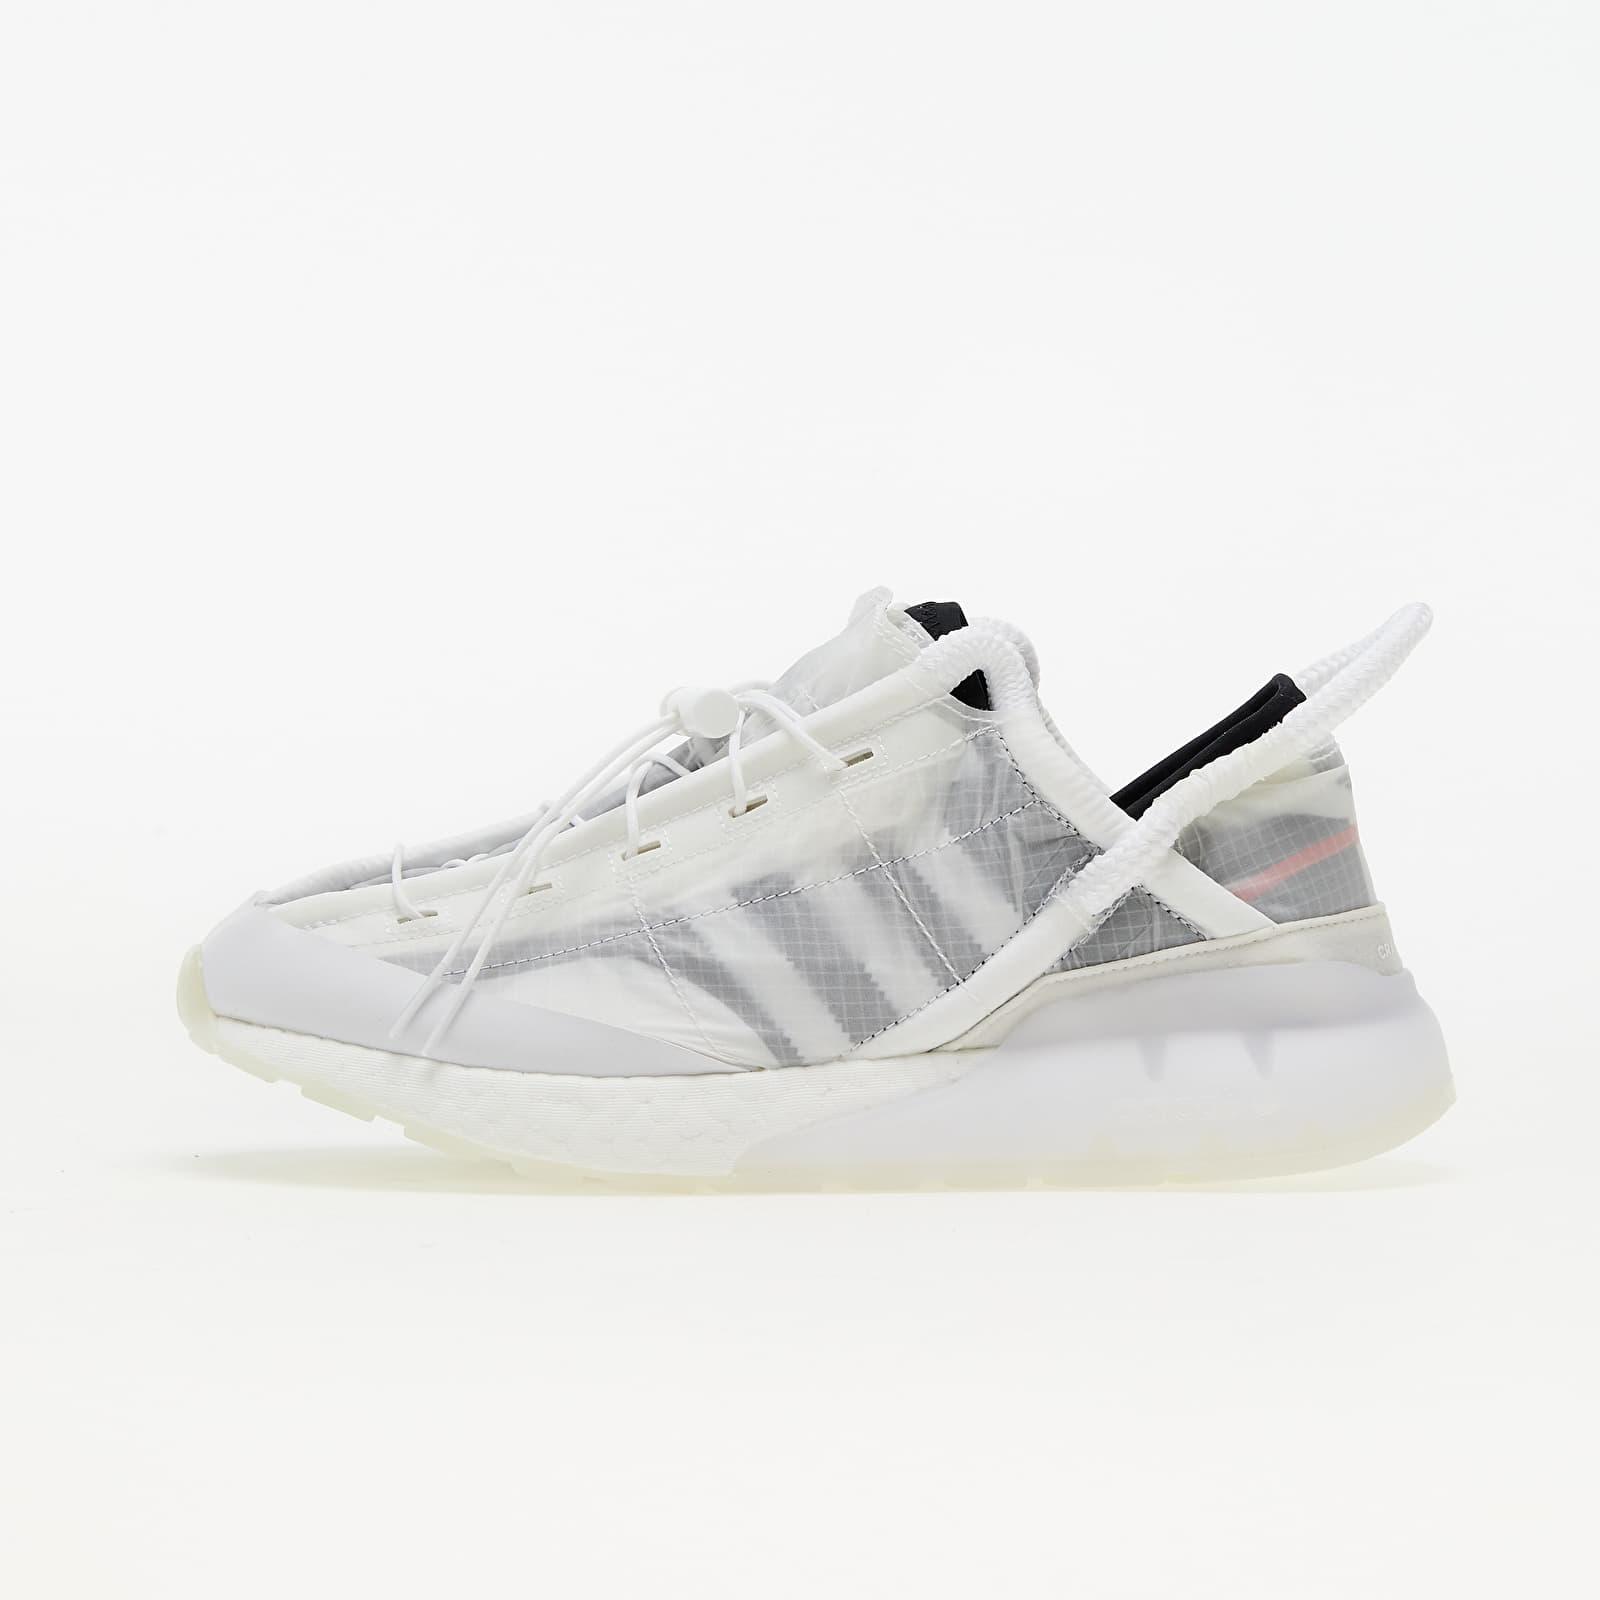 adidas x Craig Green Zx 2K Phormar Core White/ Core White/ Core Black FY5719